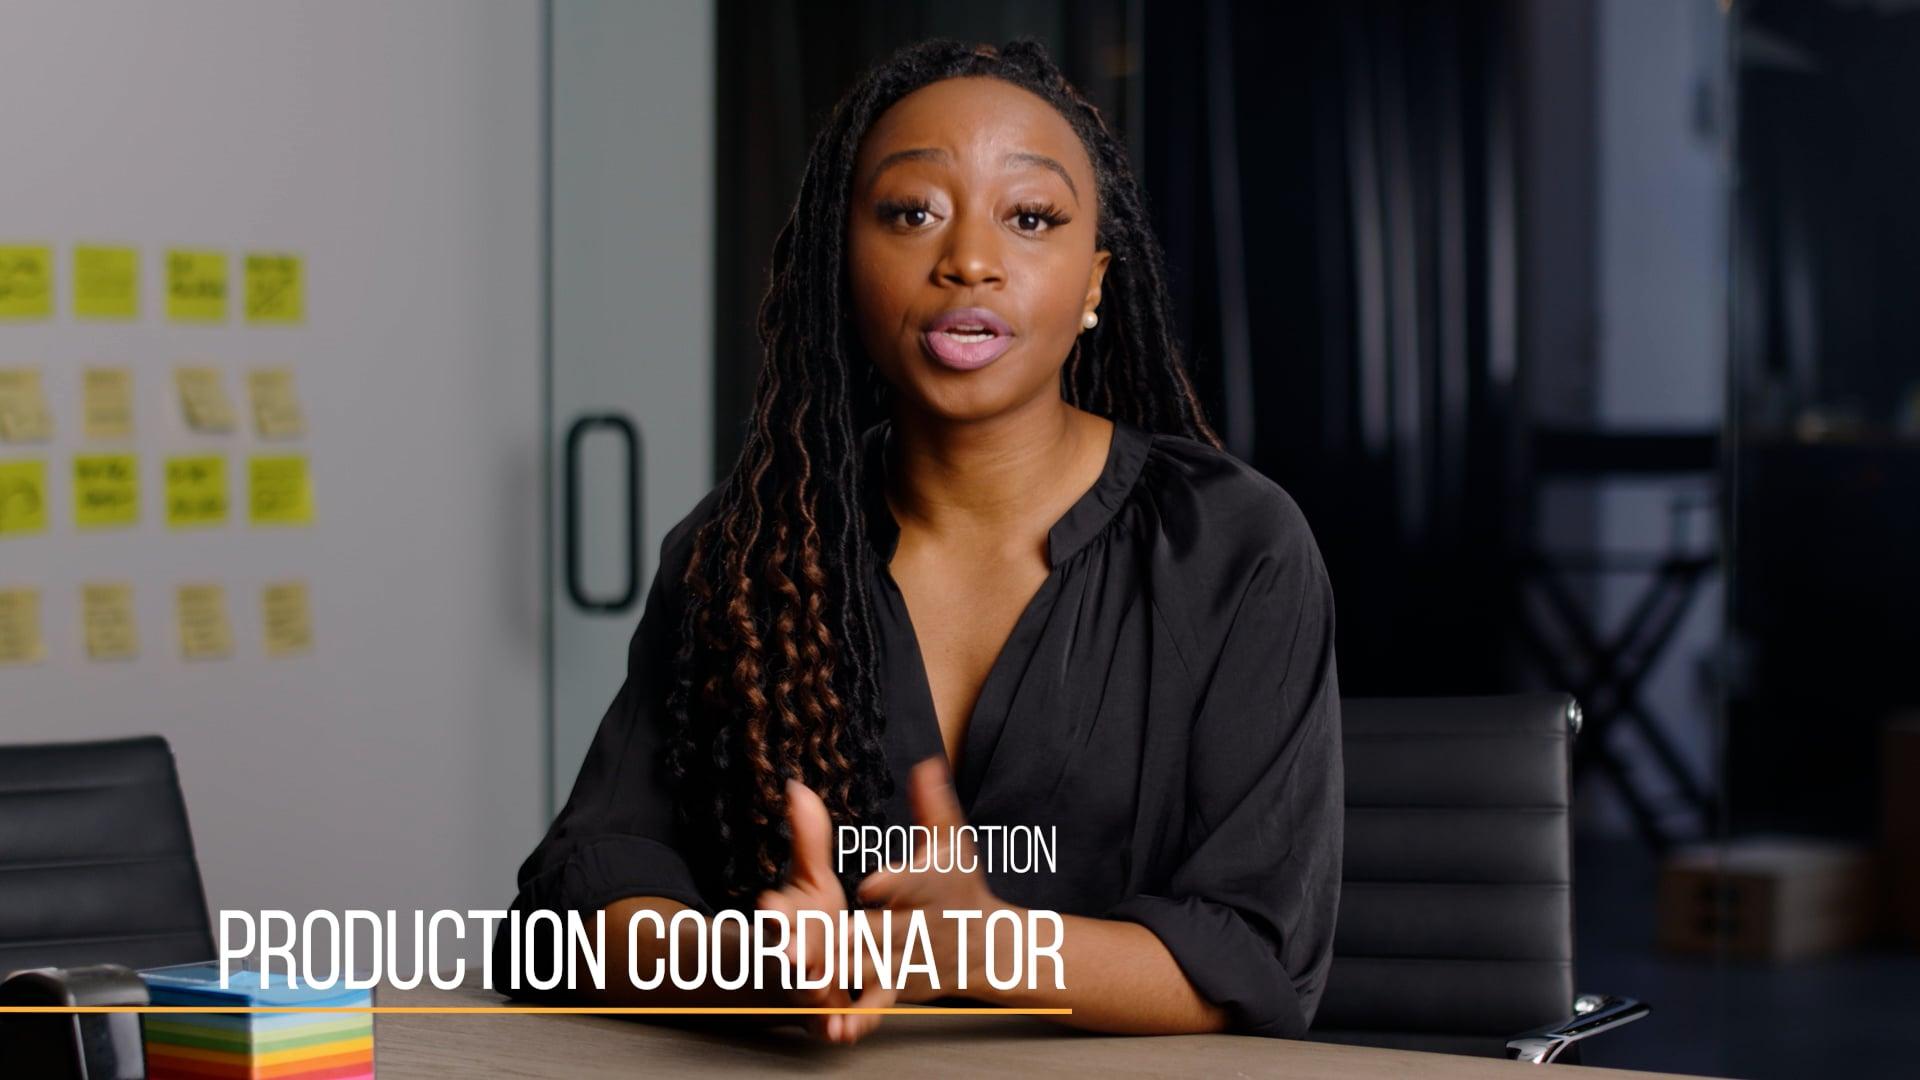 37 Production201 Production Coordinator